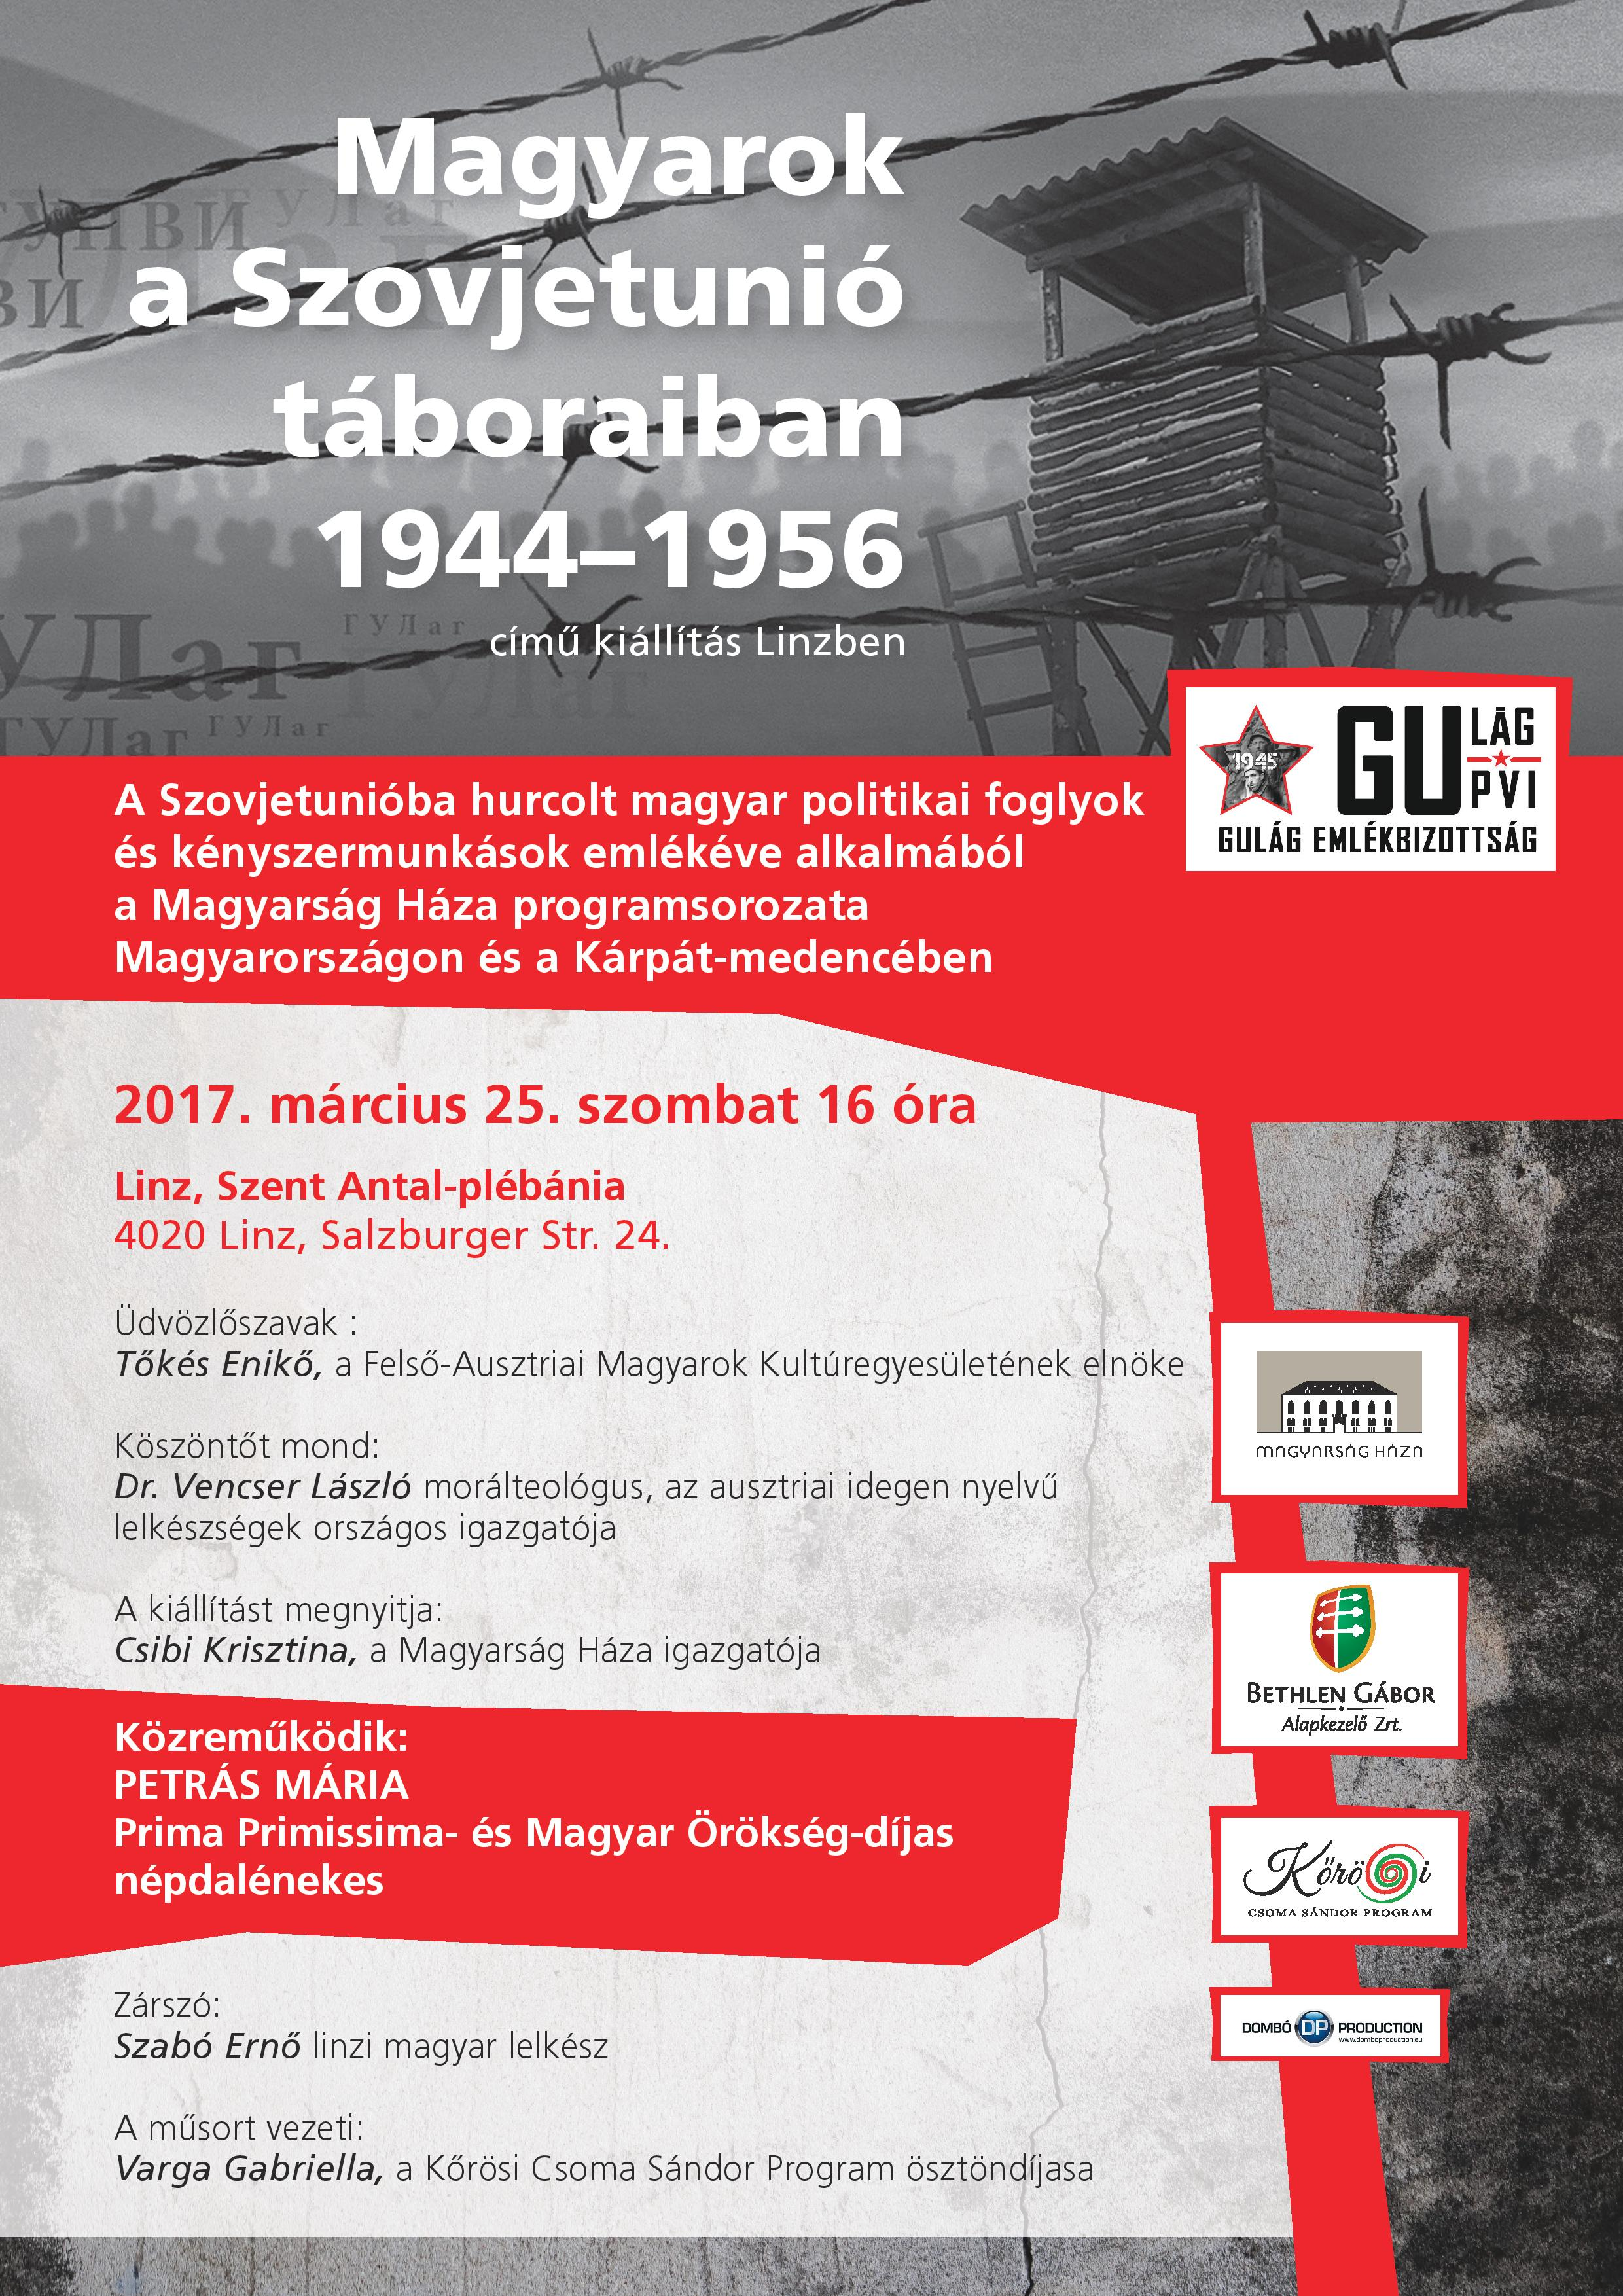 elektro_A2 Gulag emlekev_Linz-page-001